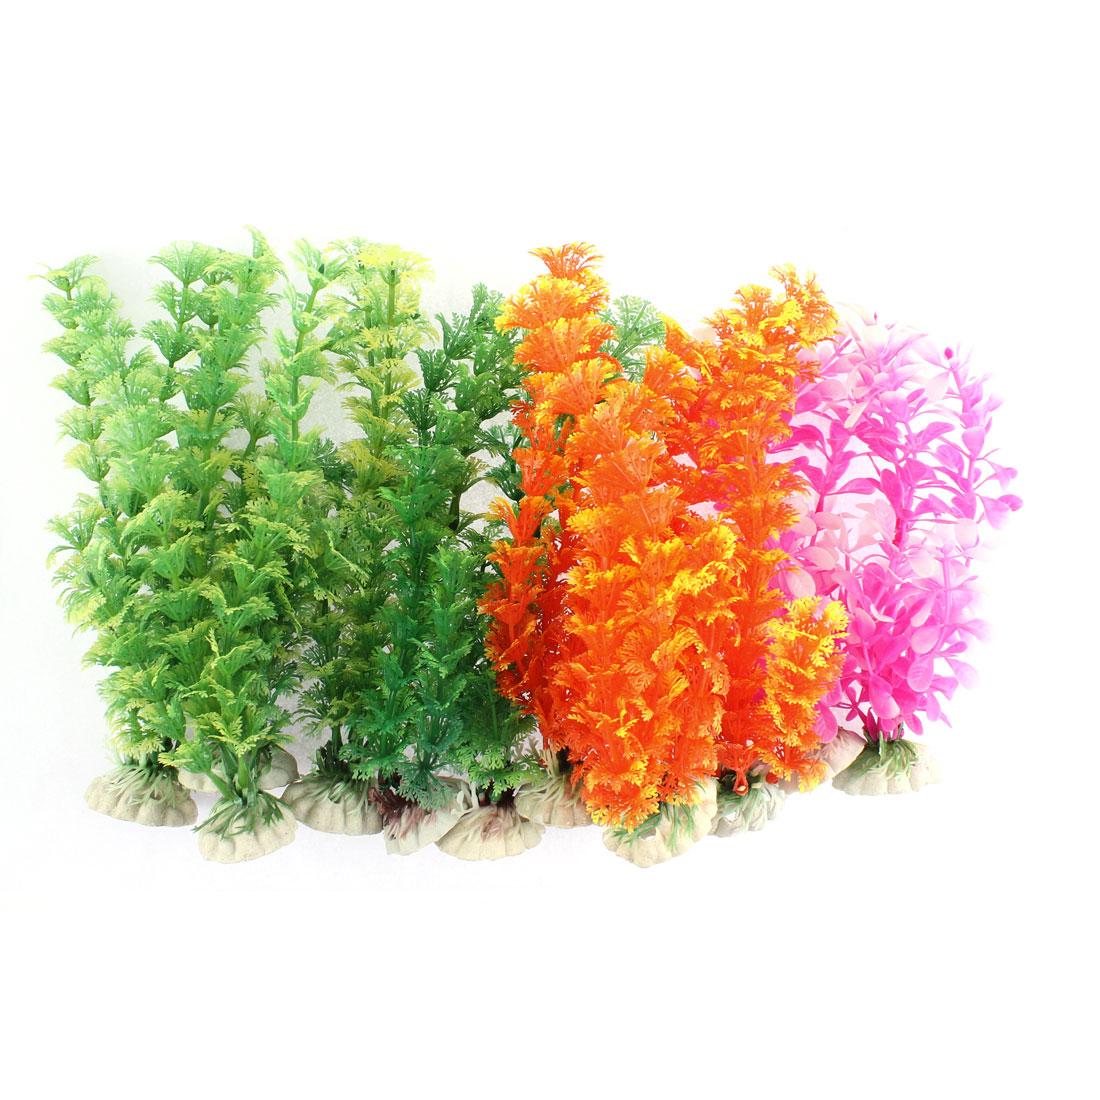 Aquarium Artificial Grass Plant Decor Multicolor 12 in 1